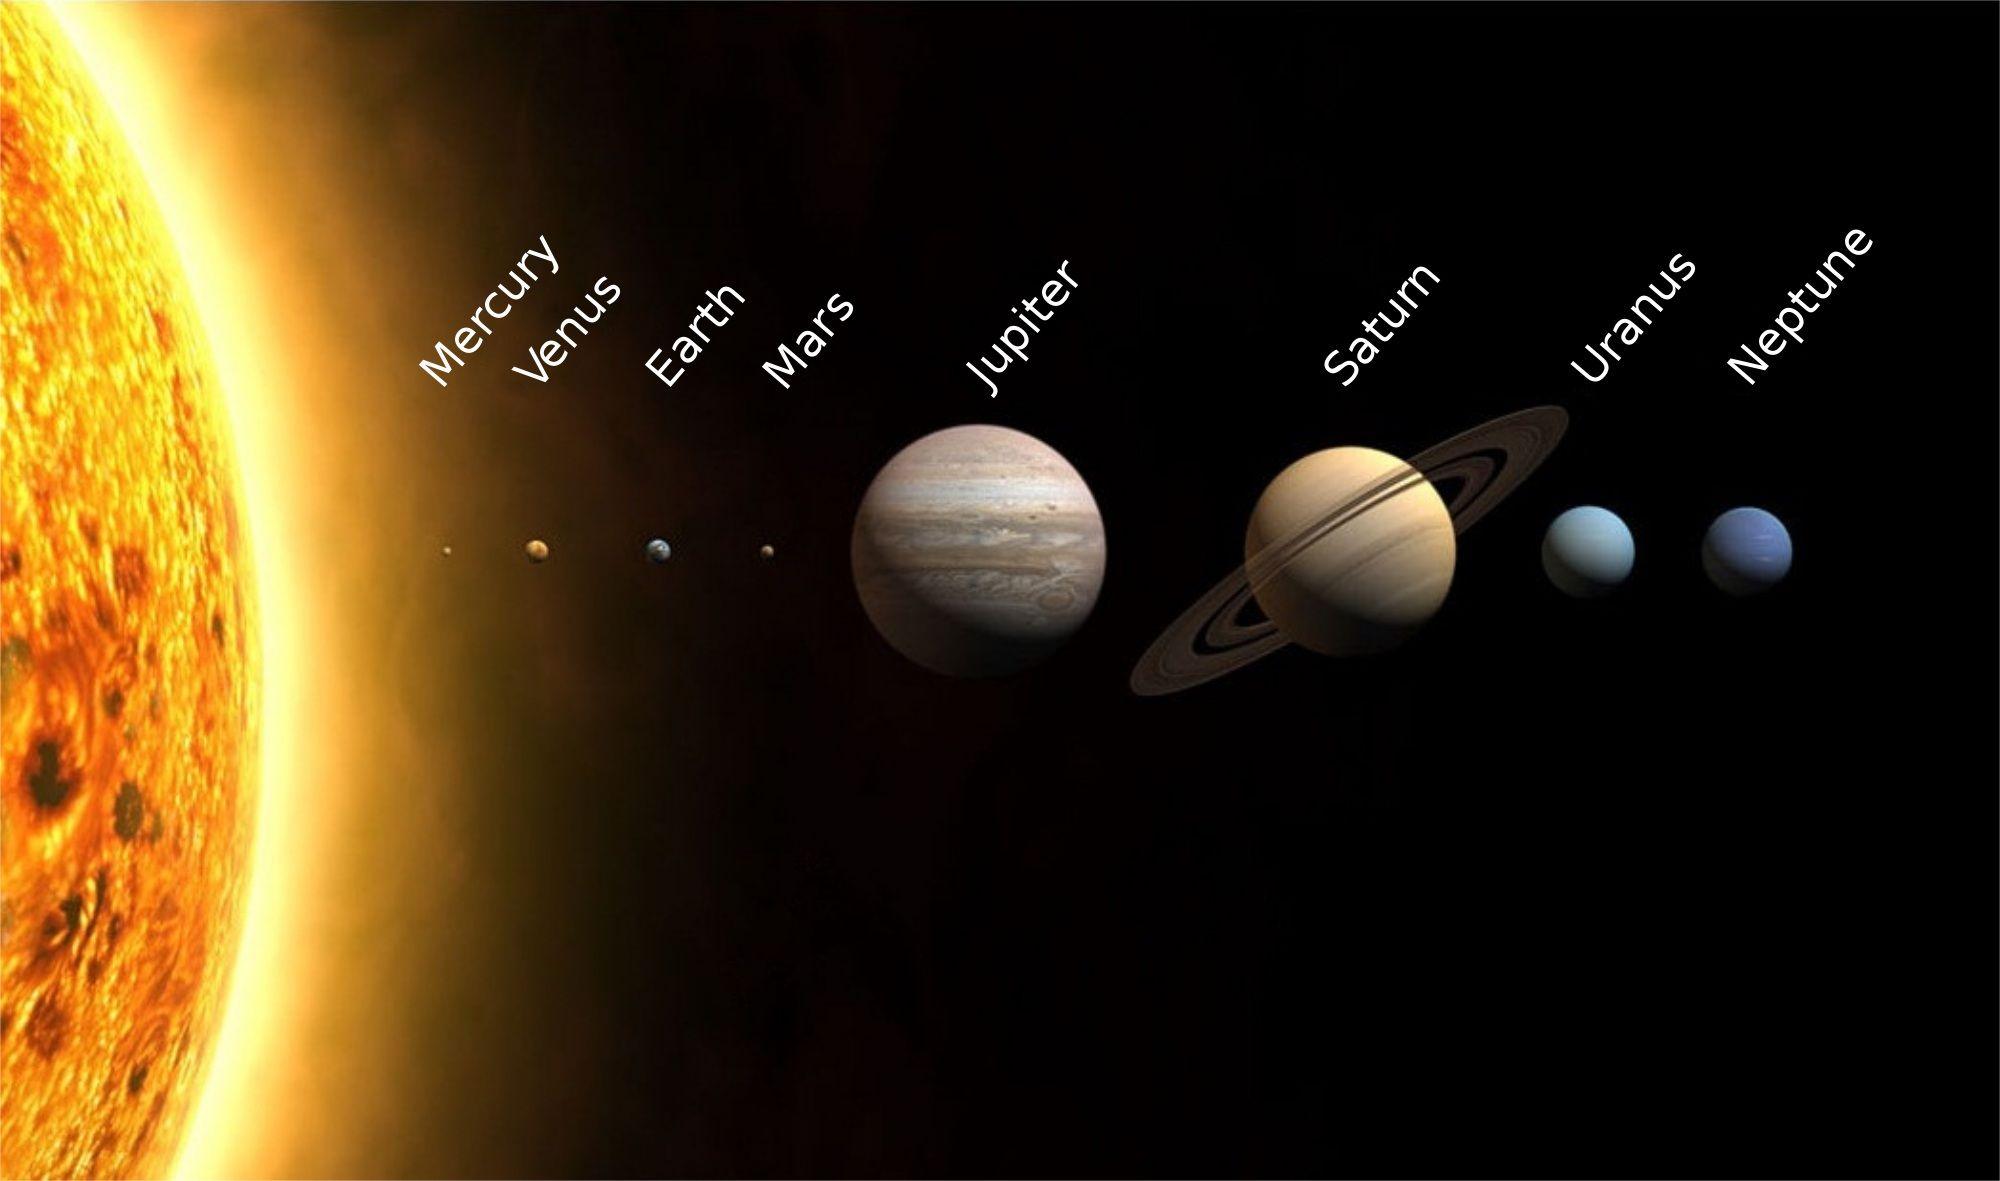 Astronom Temukan Dua Objek Kolosal, tapi Bukan Bintang Apalagi Planet